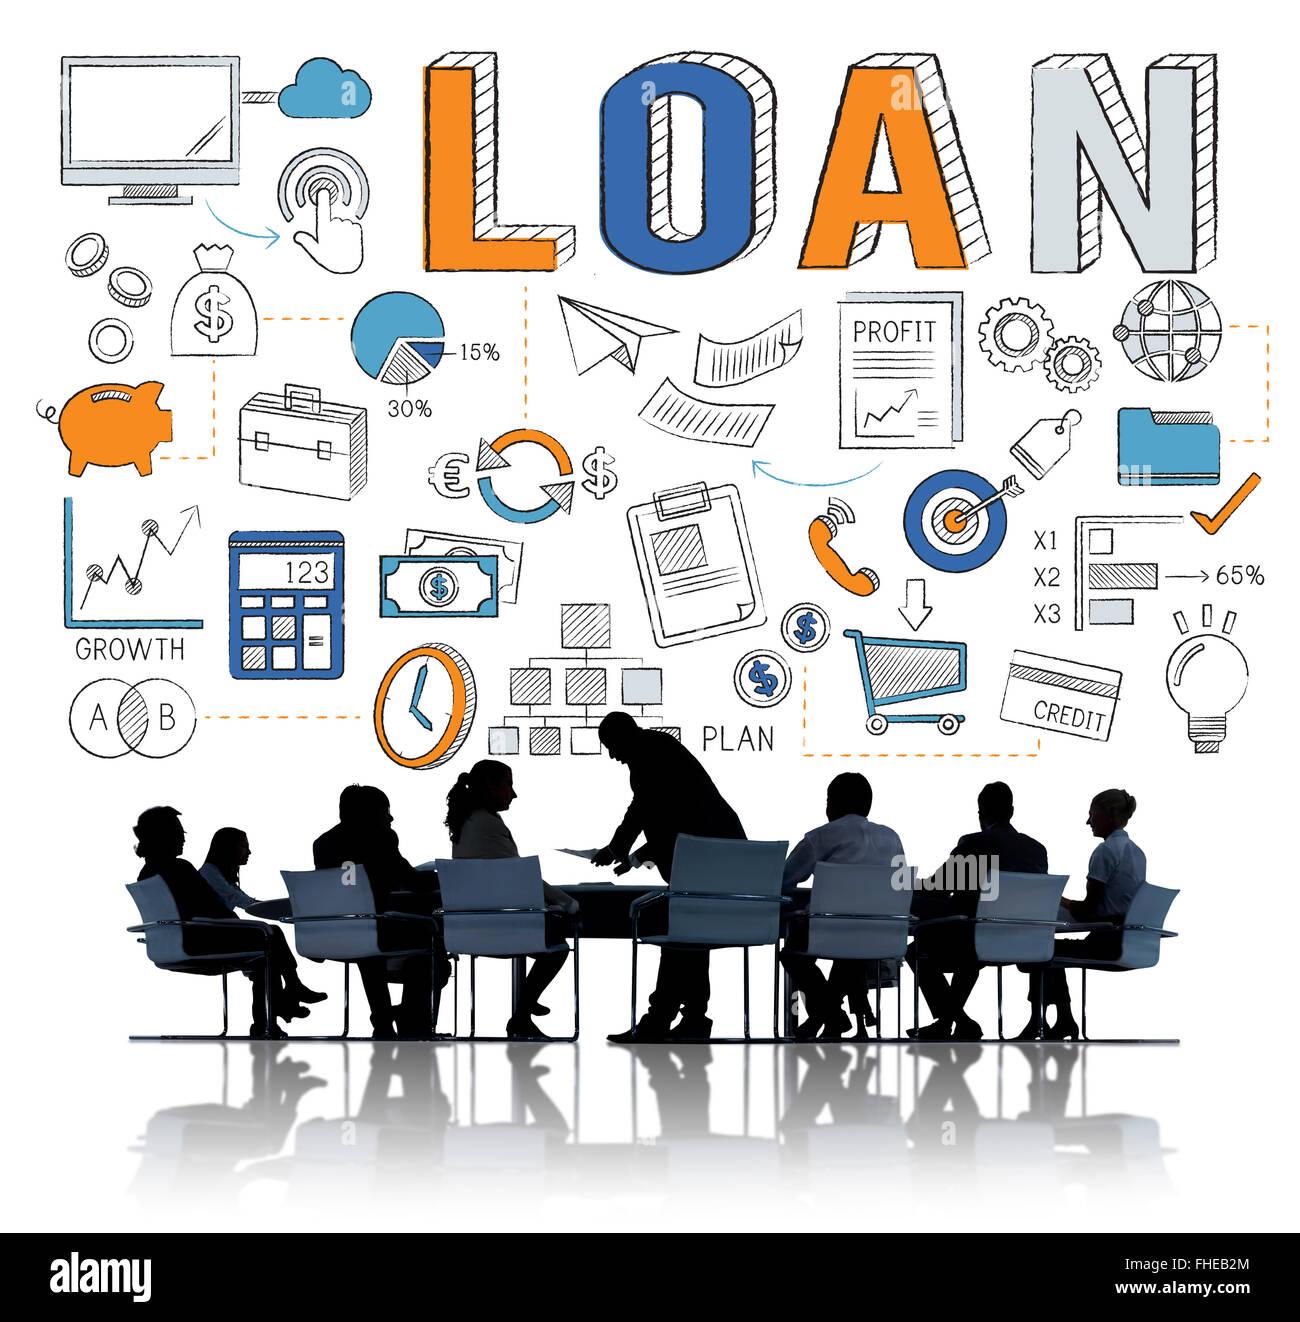 Loan Finance Economy Debt Money Banking Concept - Stock Image